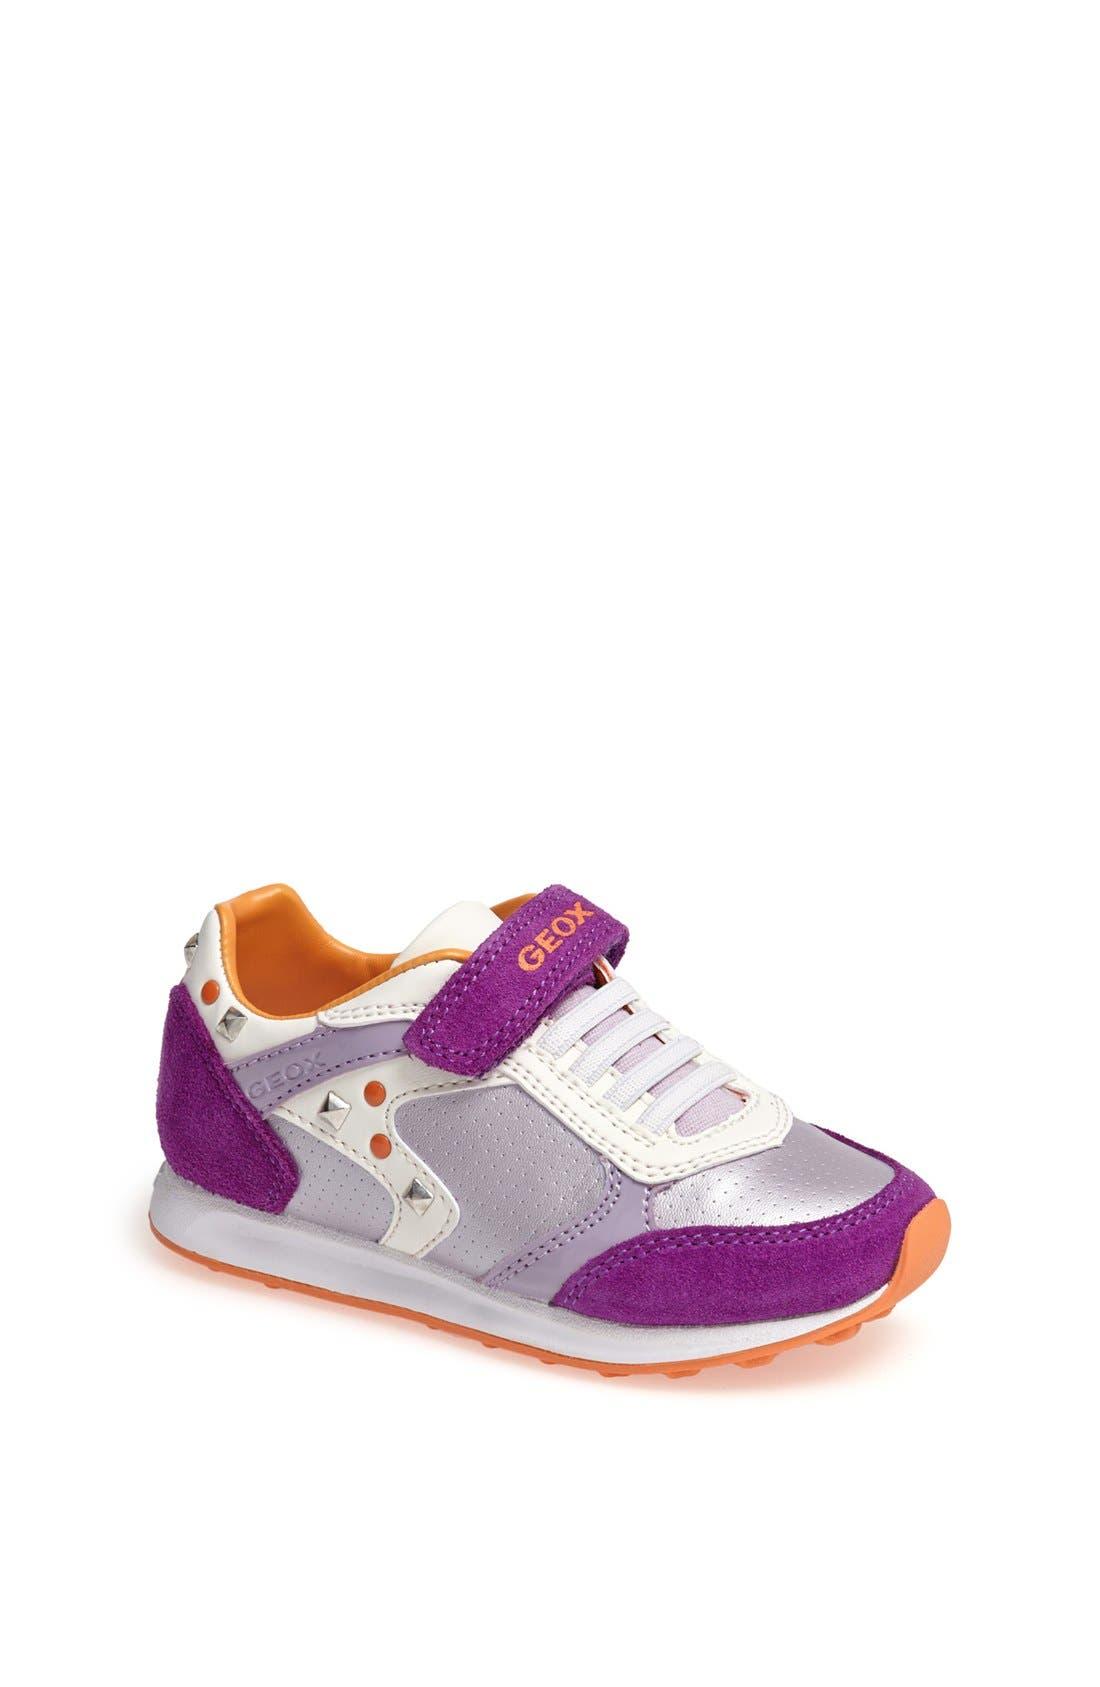 Main Image - Geox 'Elliot' Sneaker (Toddler & Little Kid)